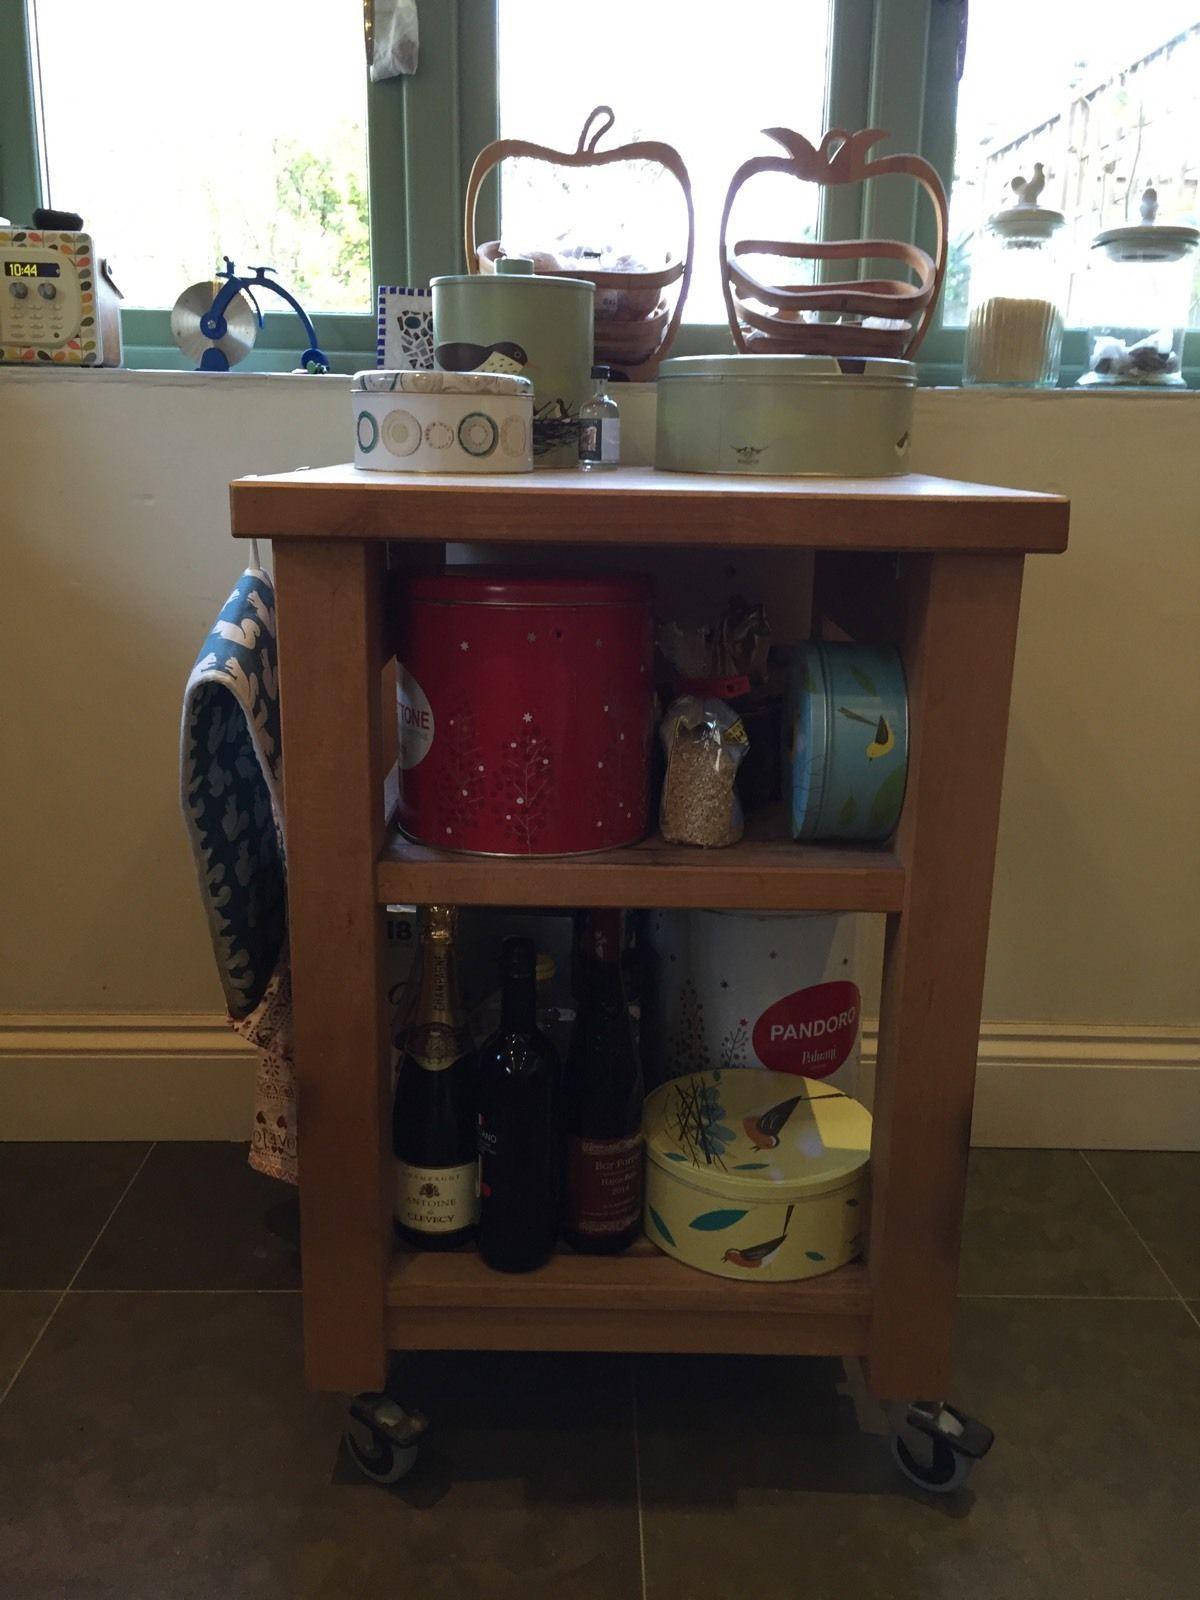 Habitat Olivia Oliva plete Kitchen USED But Good Condition